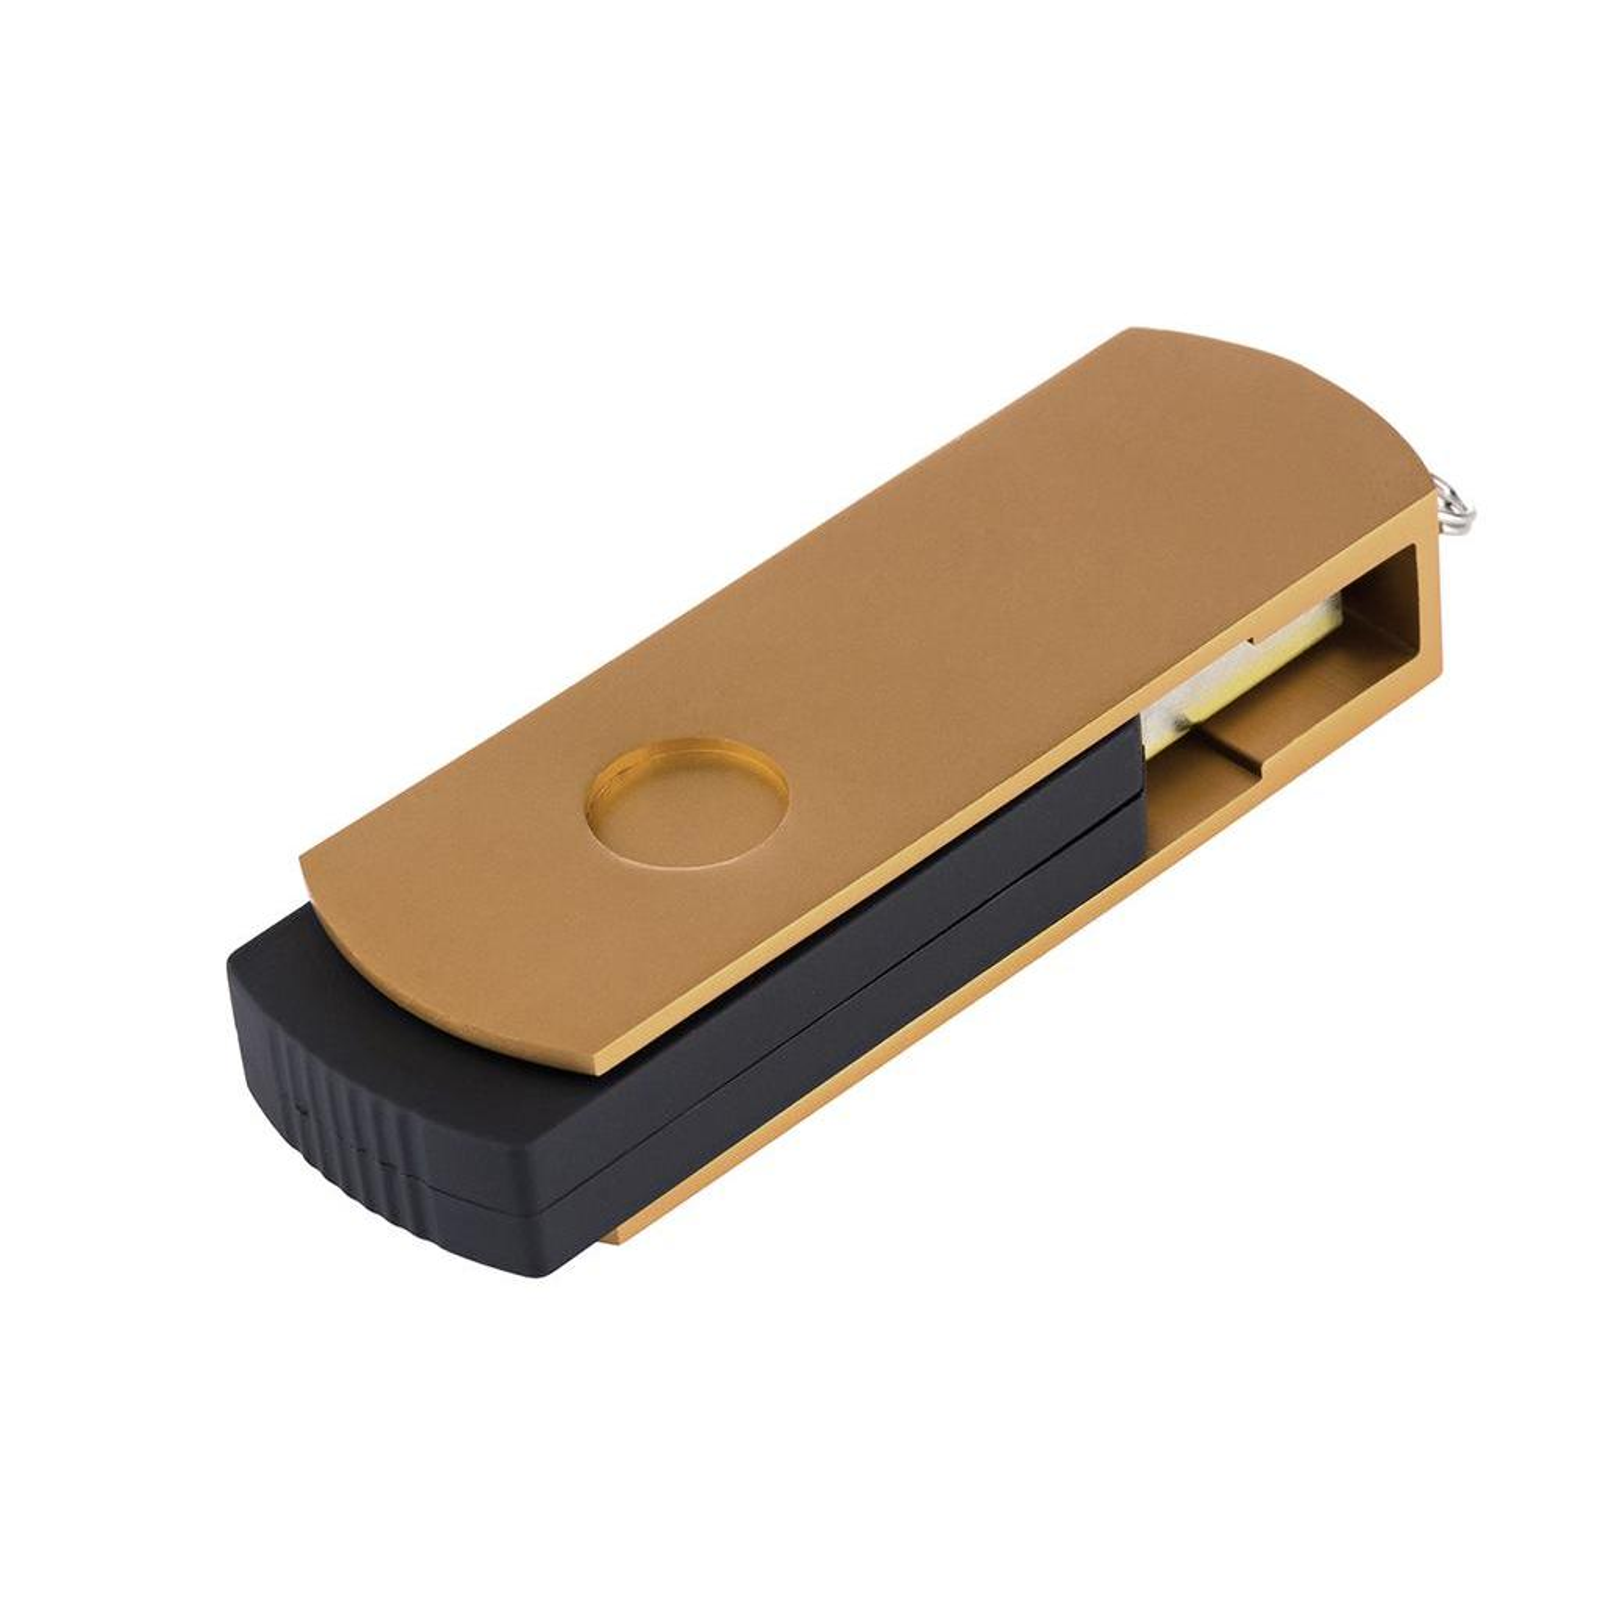 USB флеш накопитель eXceleram 32GB P2 Series Blue/Black USB 3.1 Gen 1 (EXP2U3BLB32) изображение 6